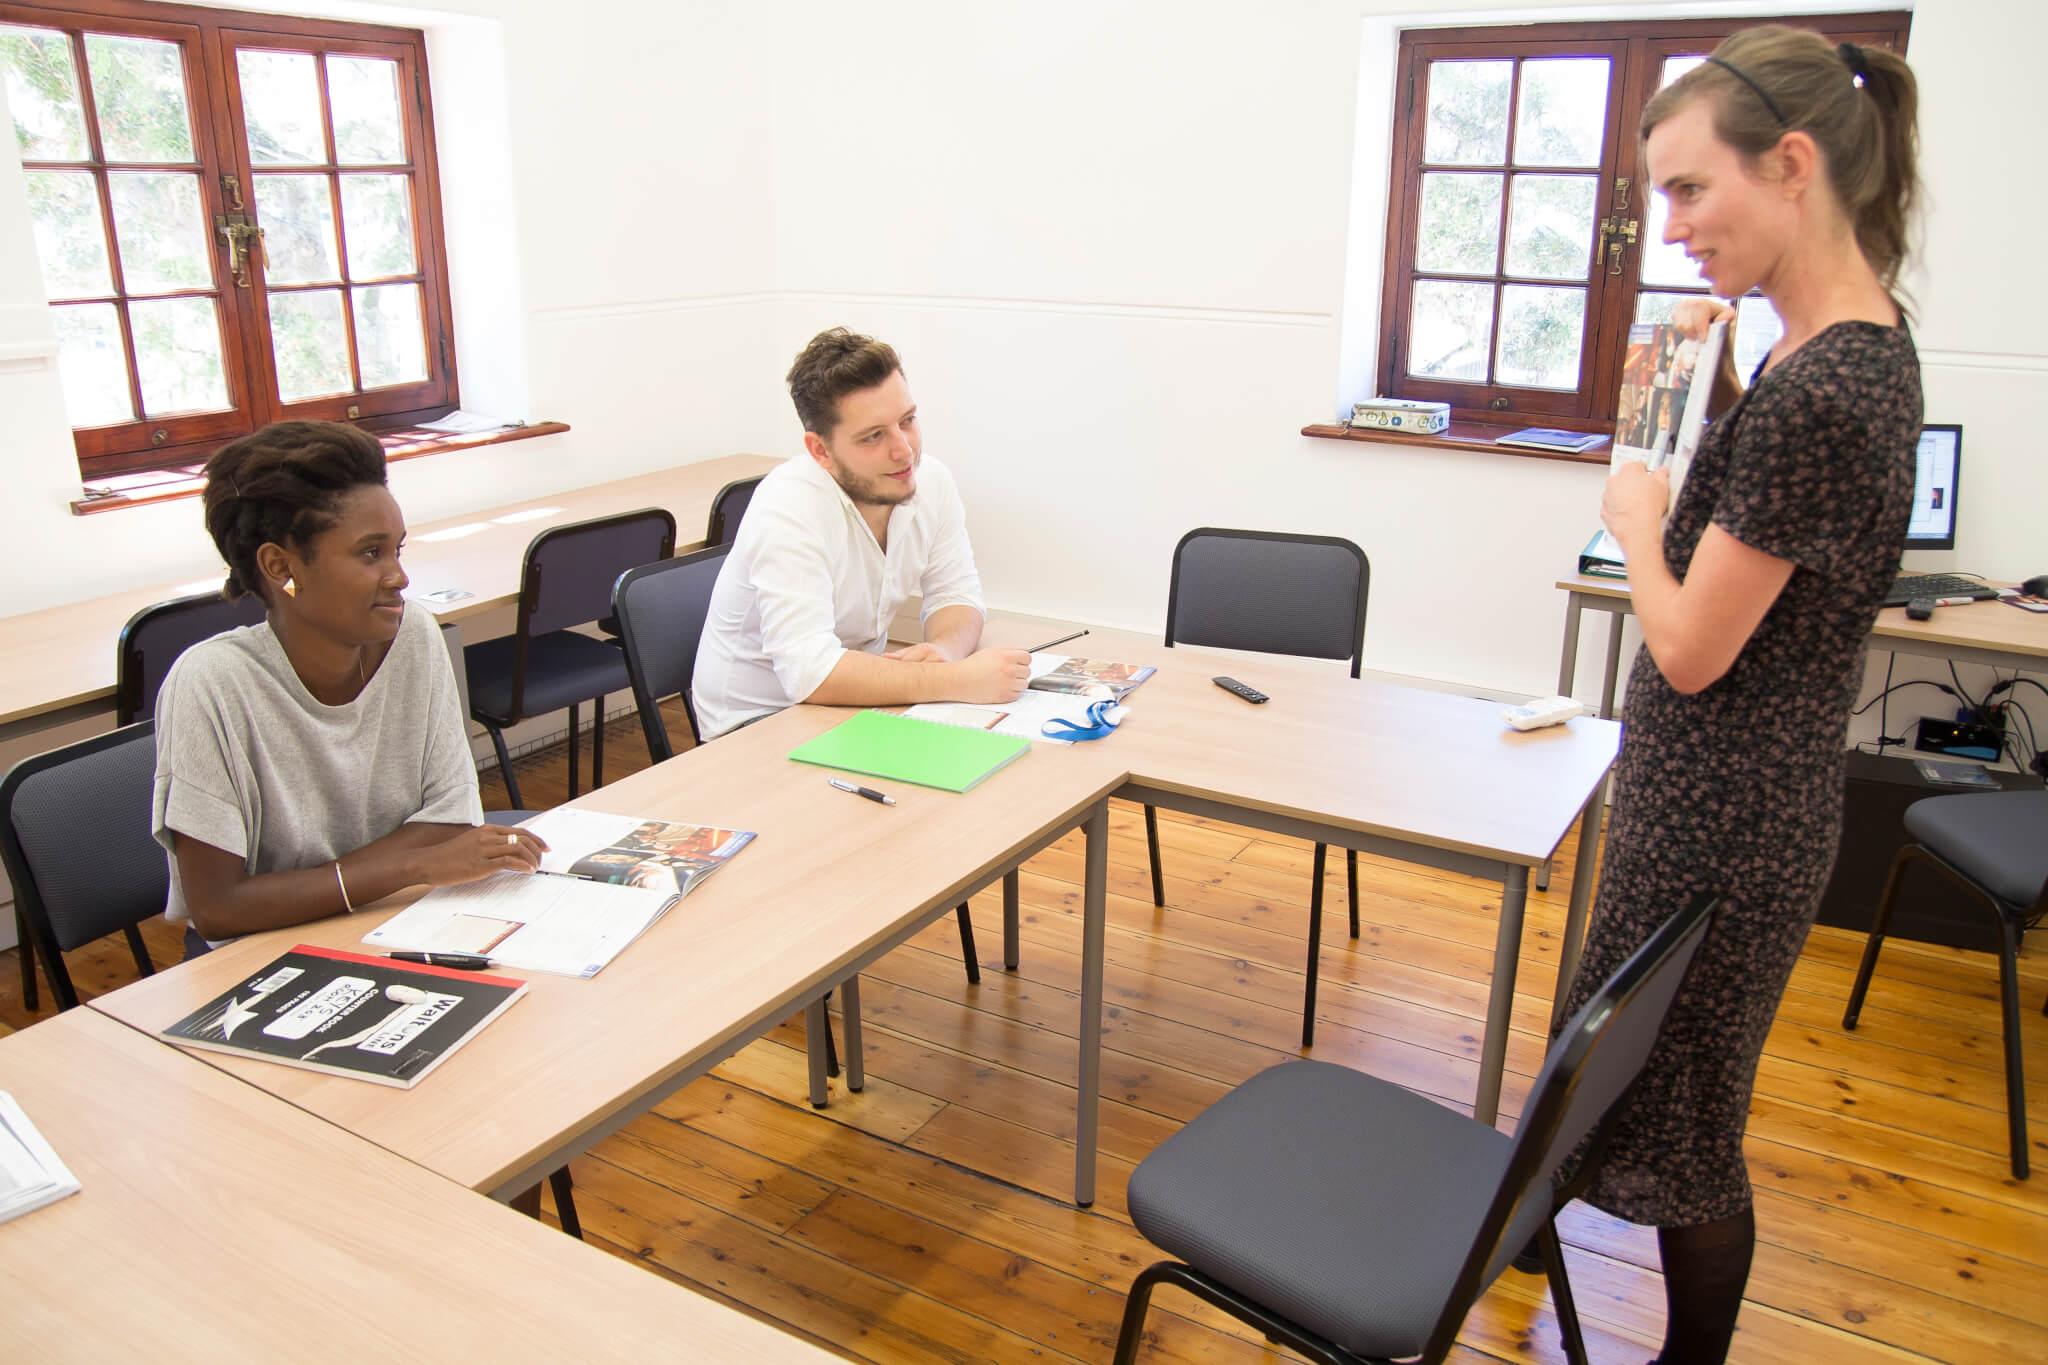 UCT English Language Centre Teacher Catherine